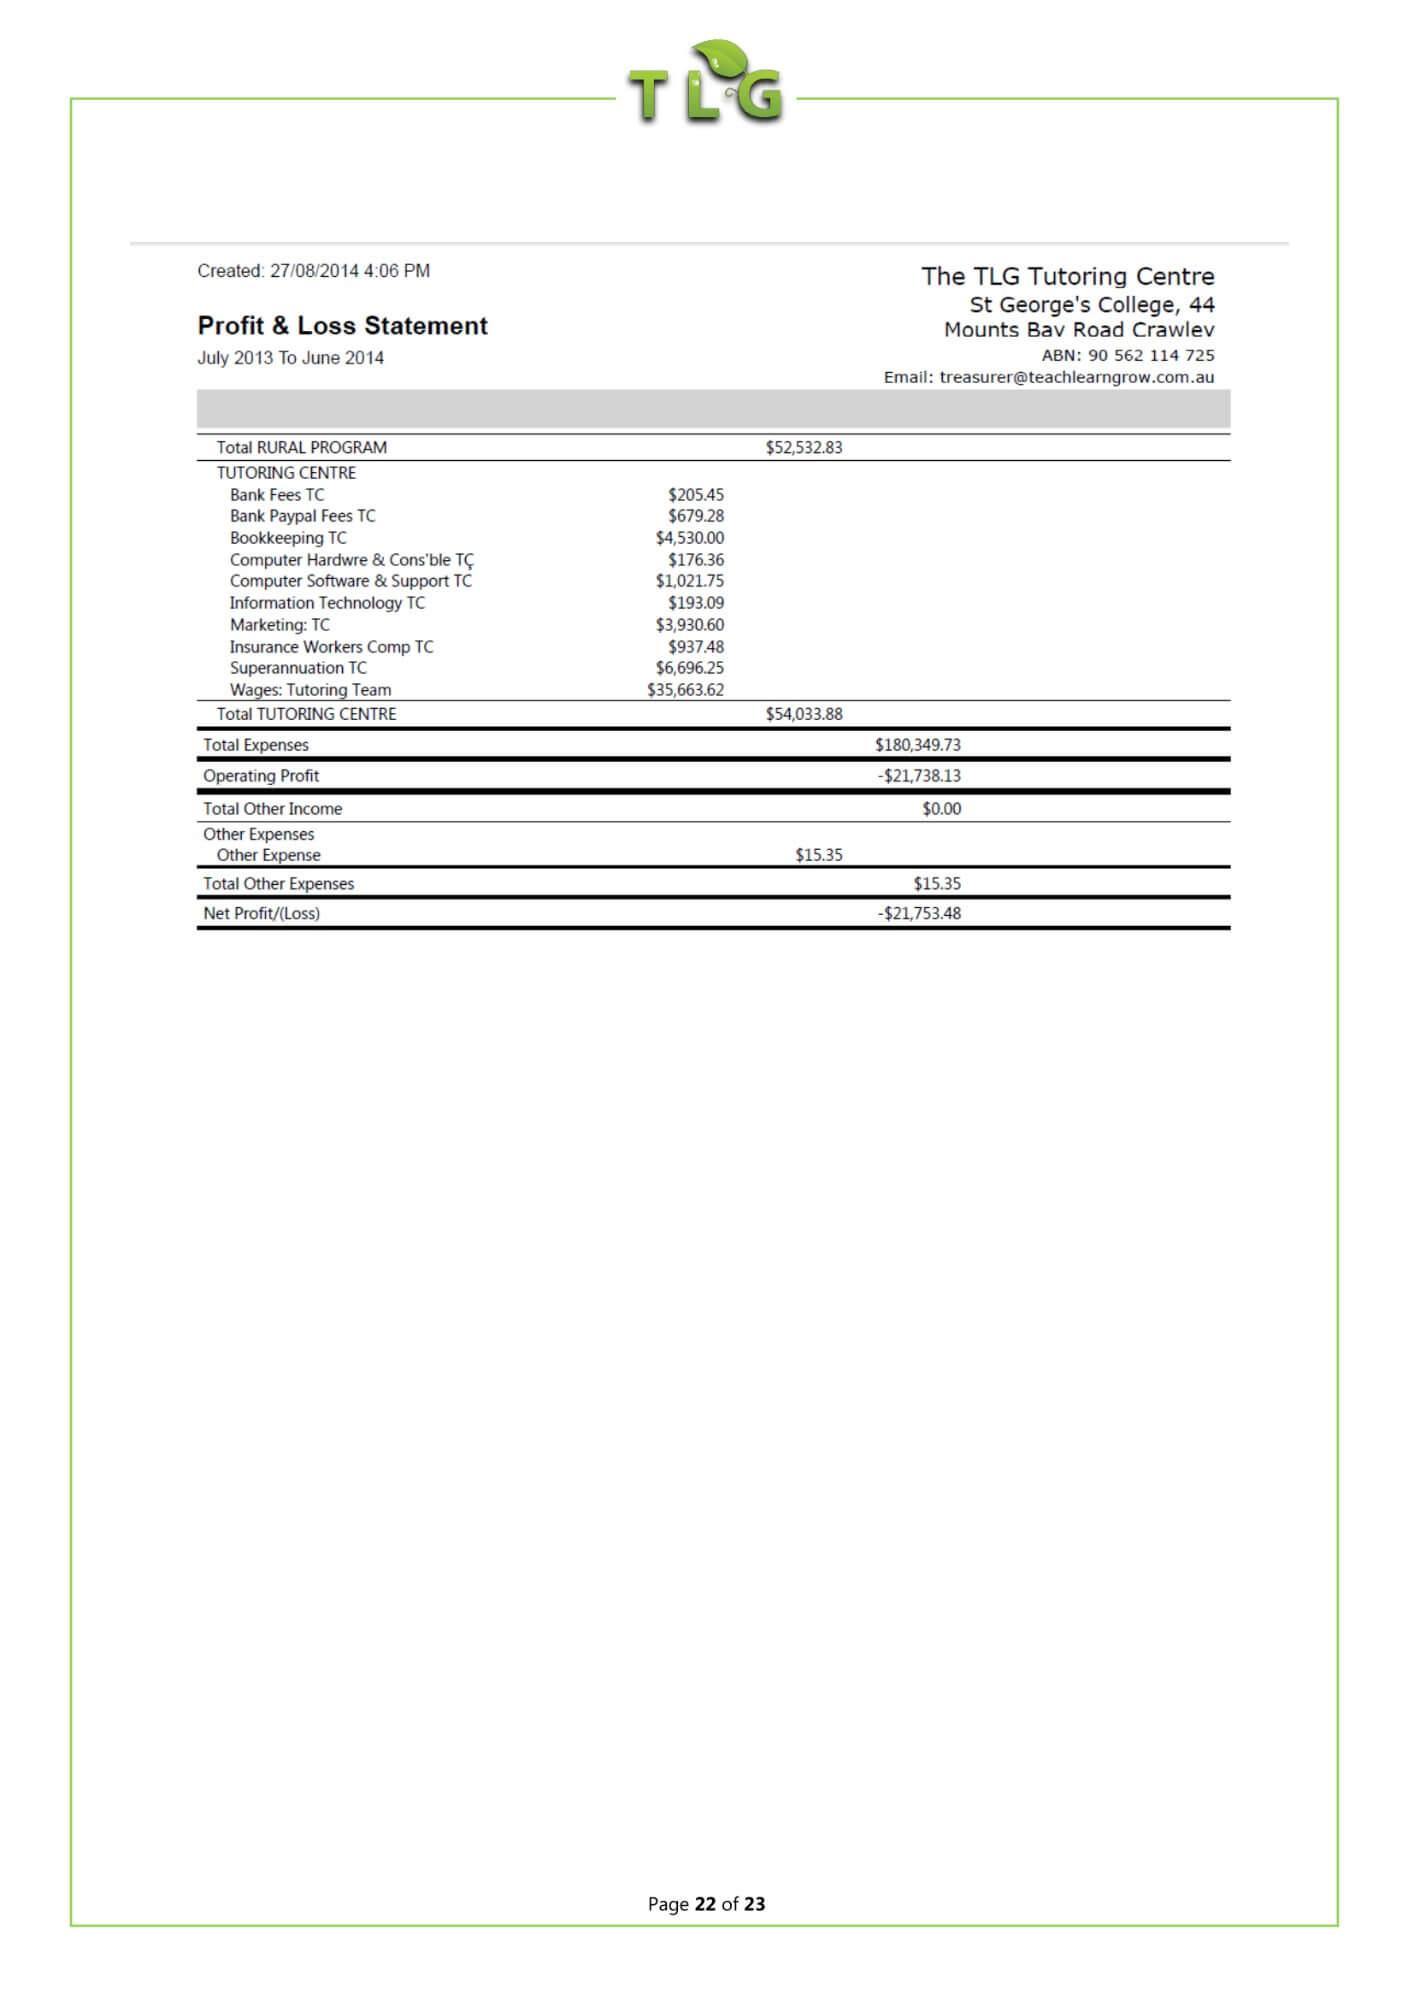 tlg-annual-report-FY13-22.jpg